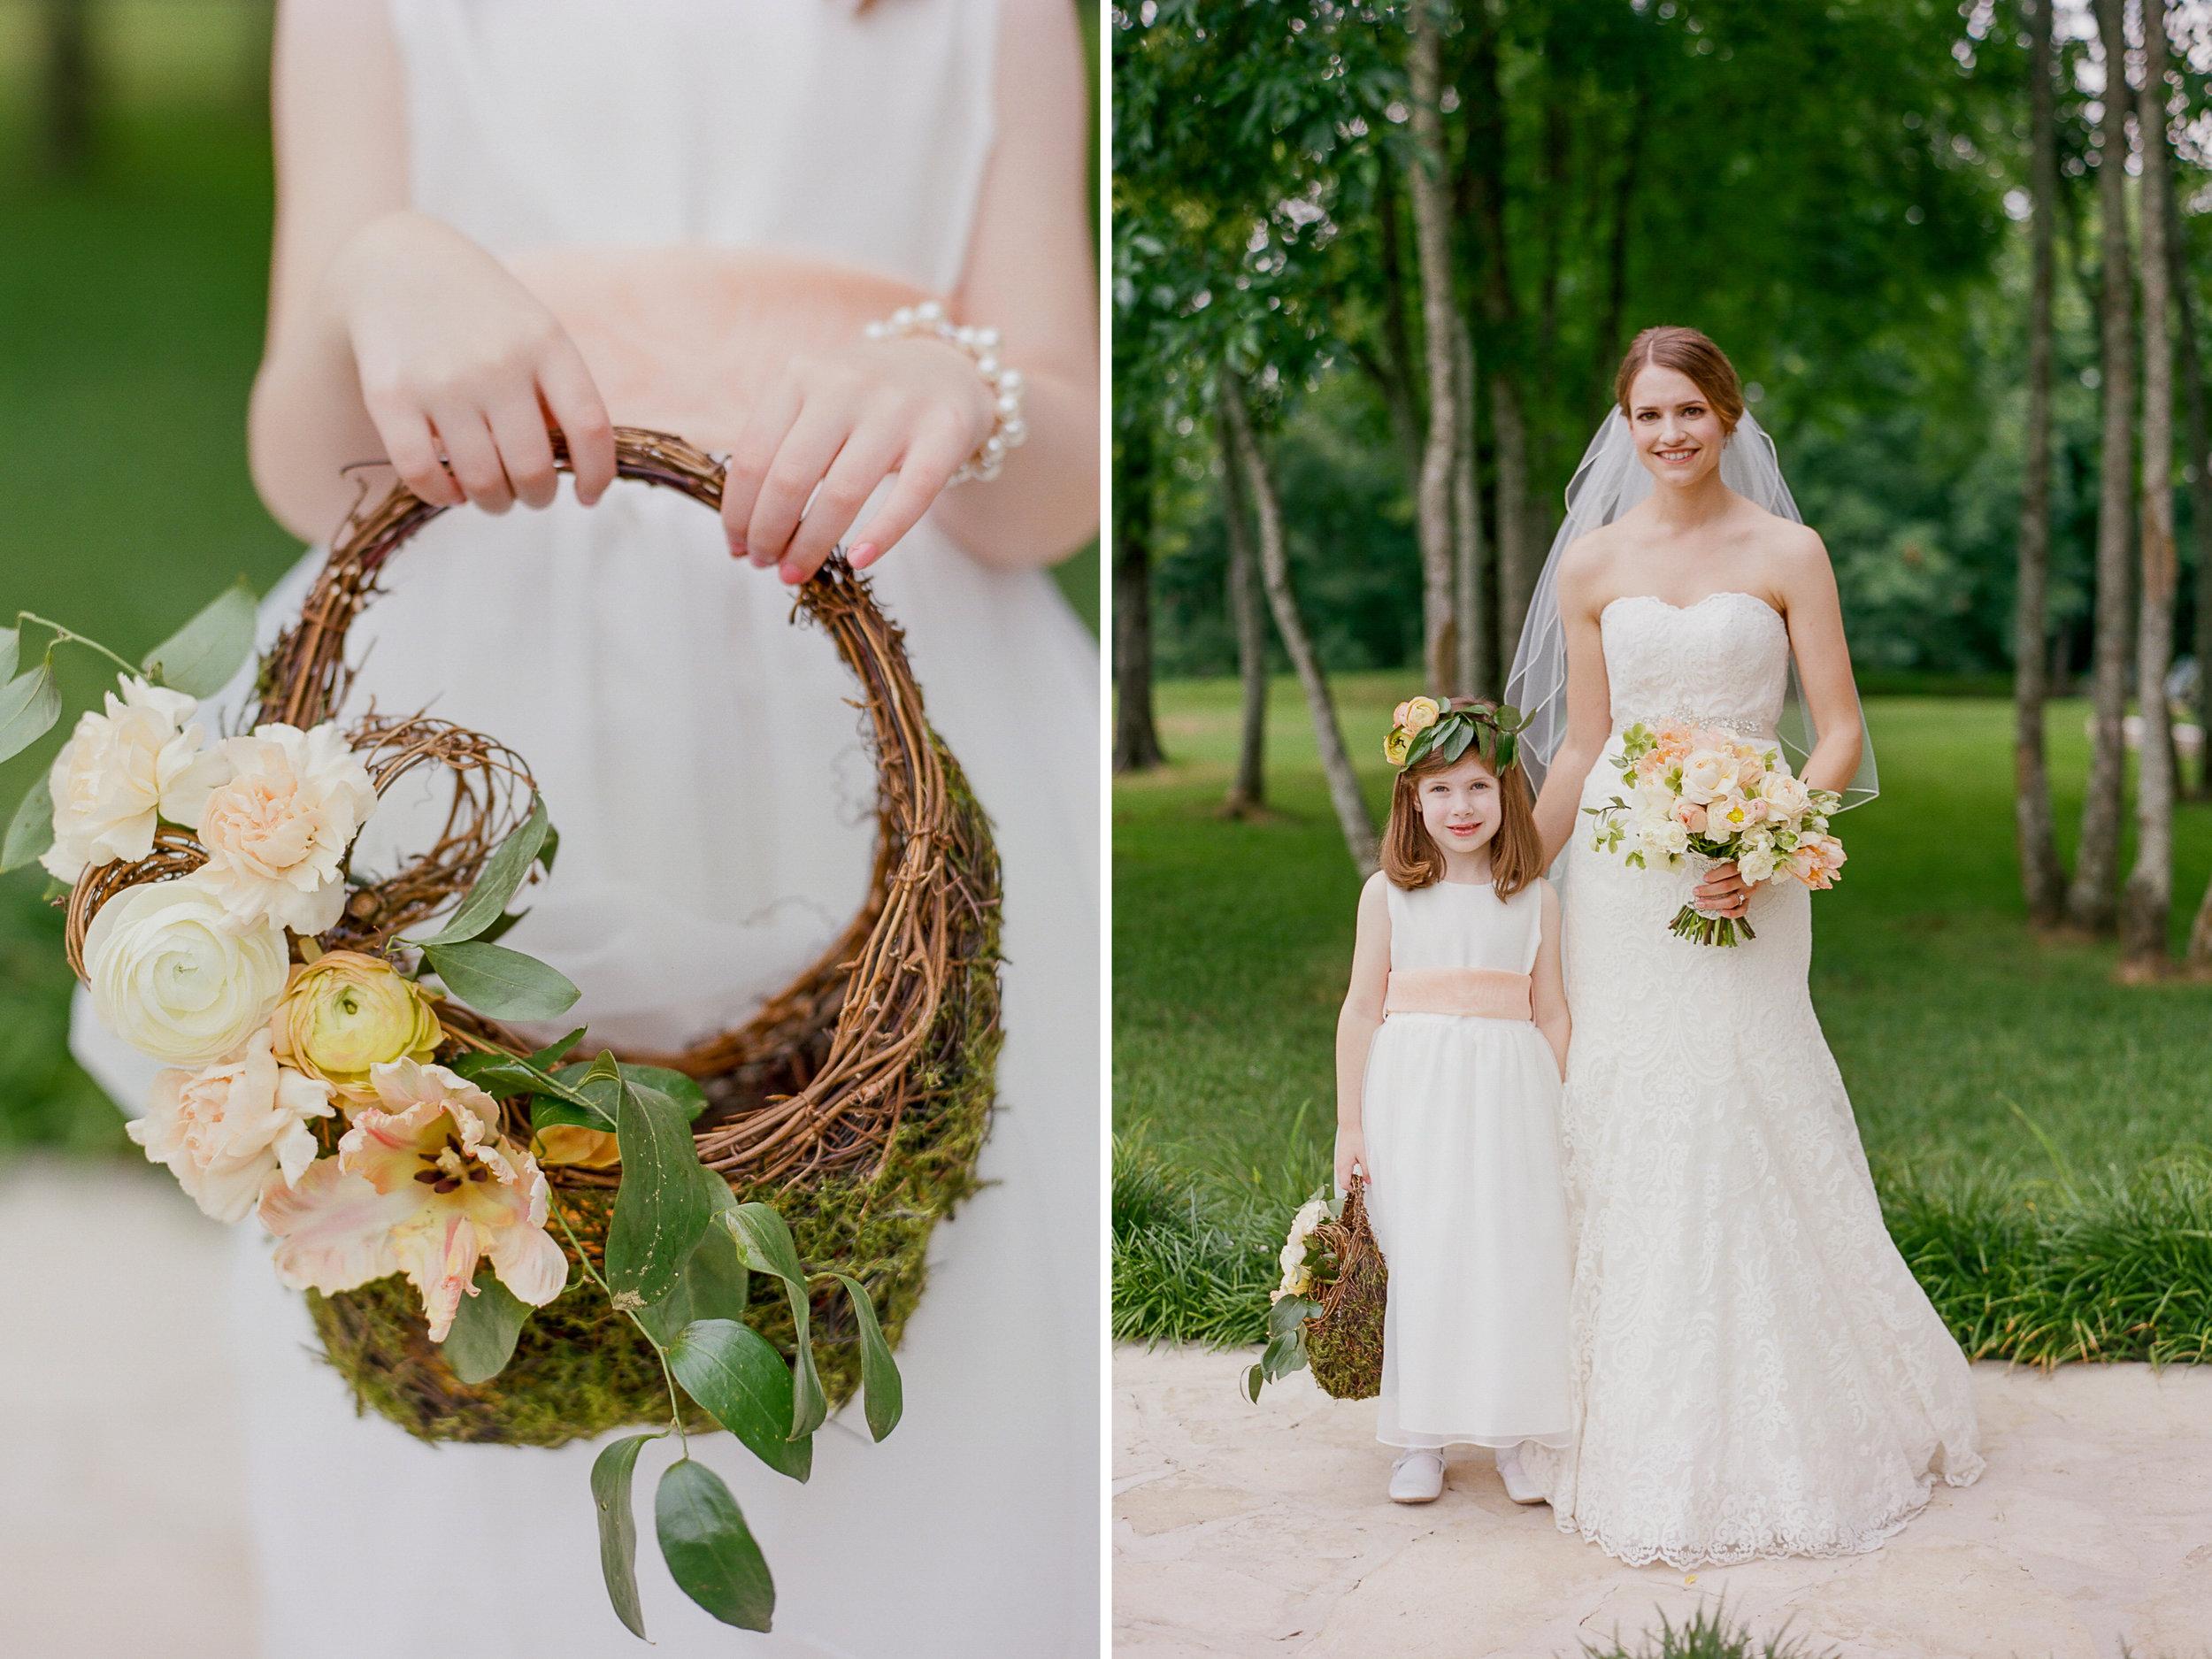 The-Knot-Wedding-Houston-Photographer-Fine-Art-Dana-Fernandez-Photography-Film-110.jpg